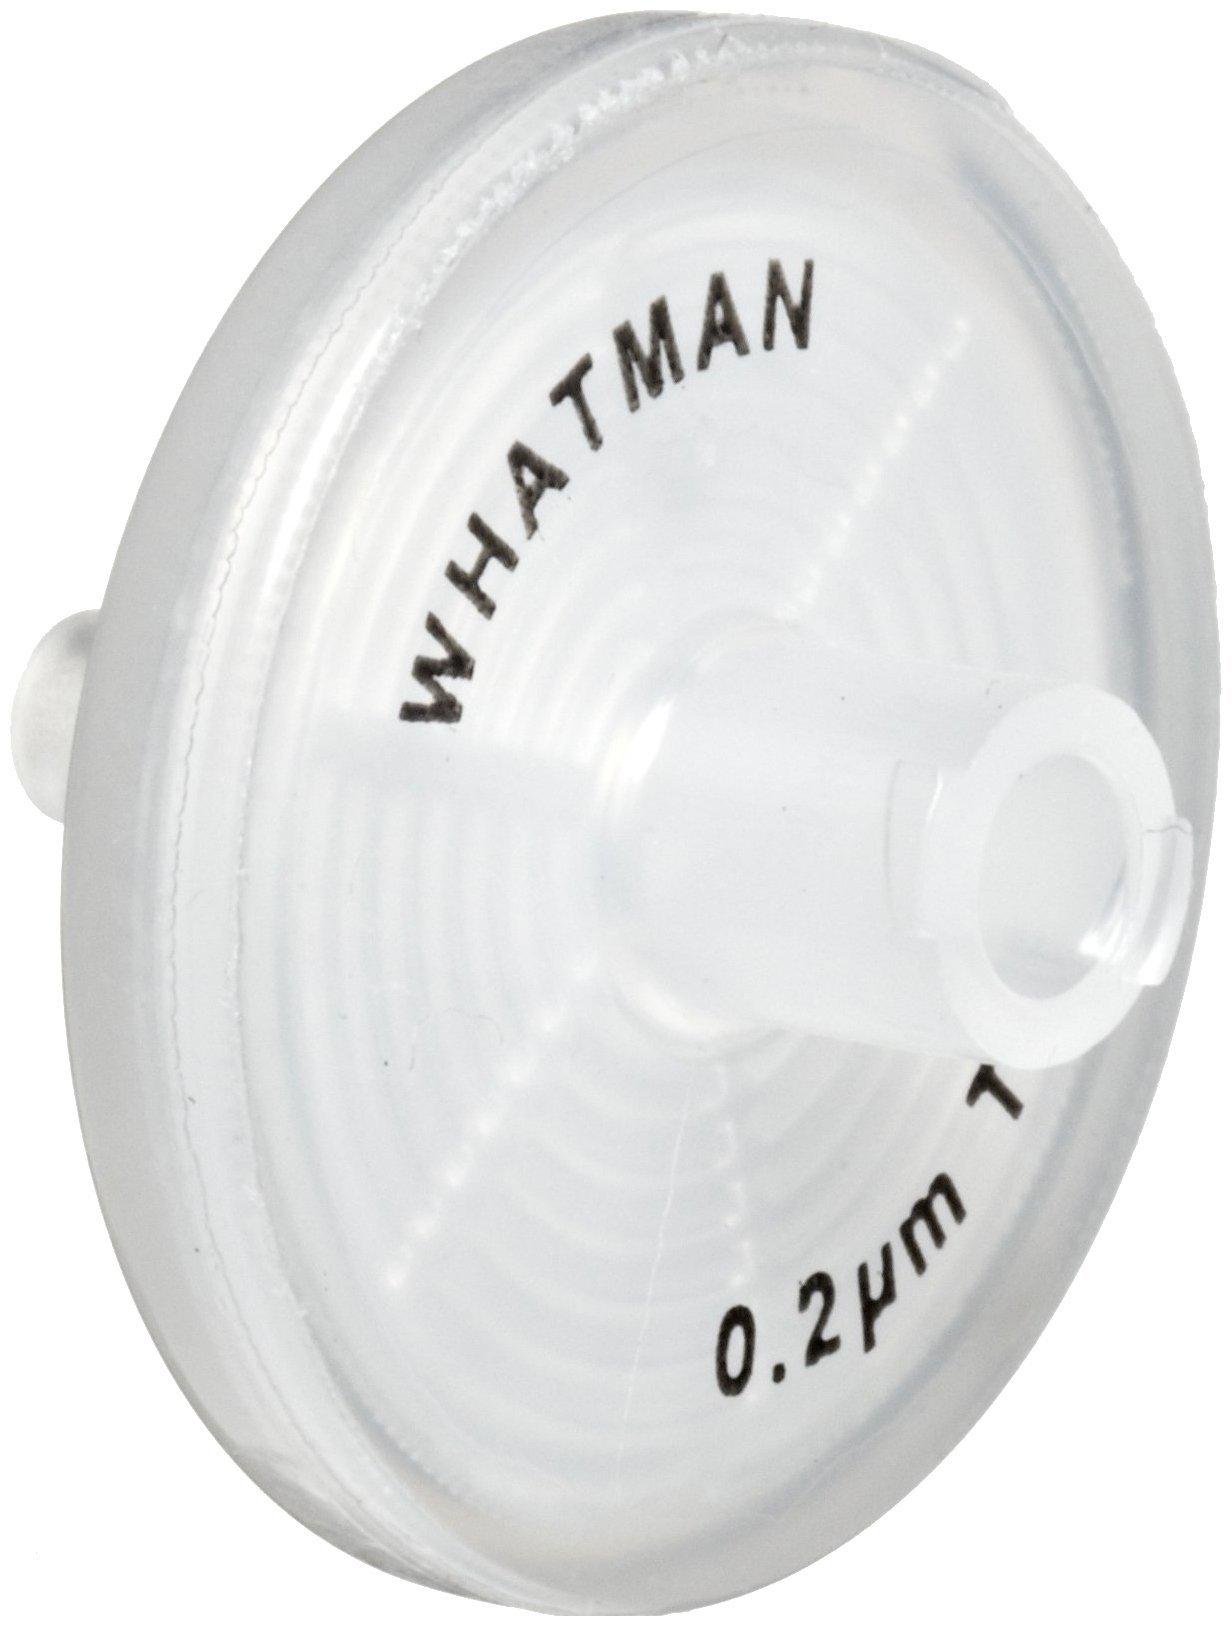 Whatman 6784-2502 PTFE Puradisc 25 Syringe Filter, 0.2 Micron